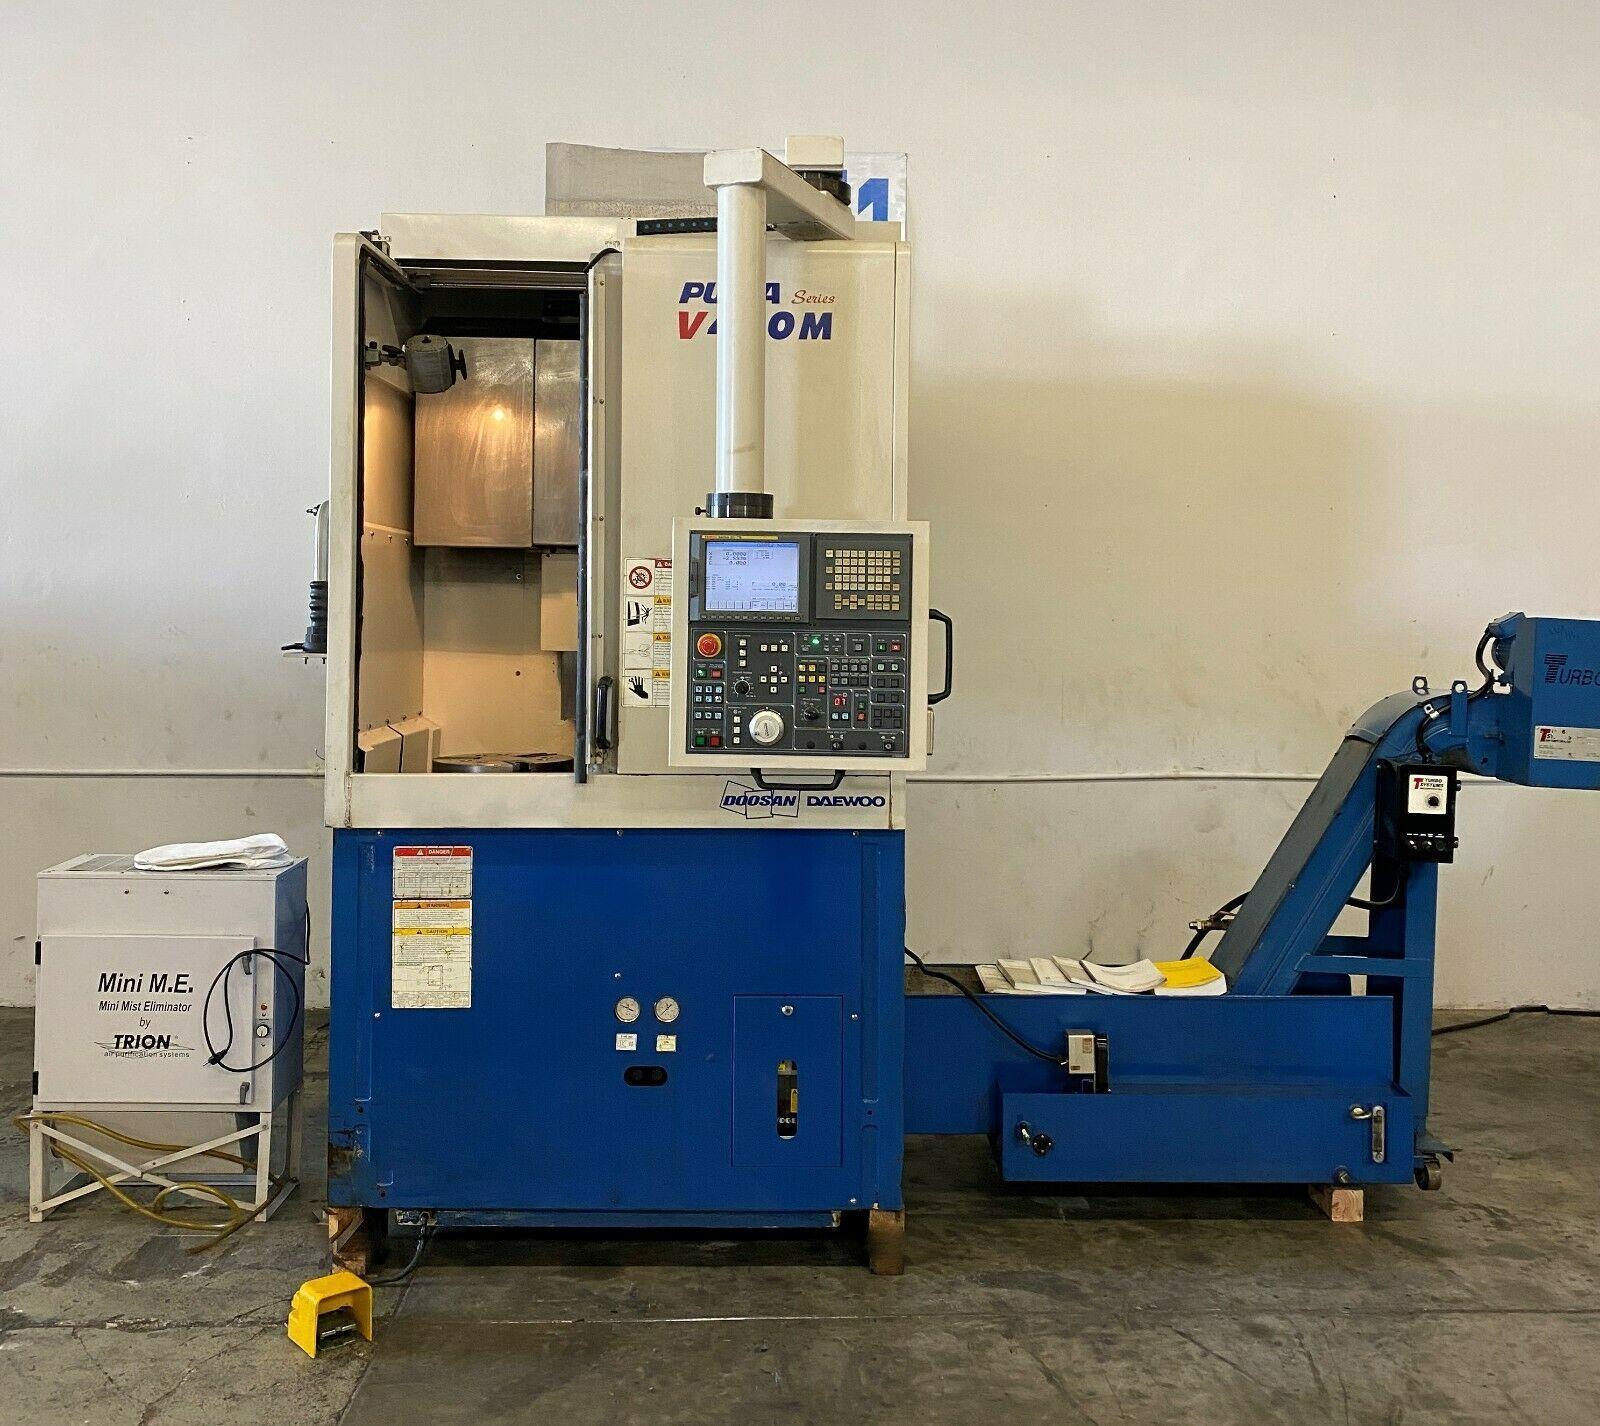 Daewoo Doosan V400M CNC Vertical Turn Mill